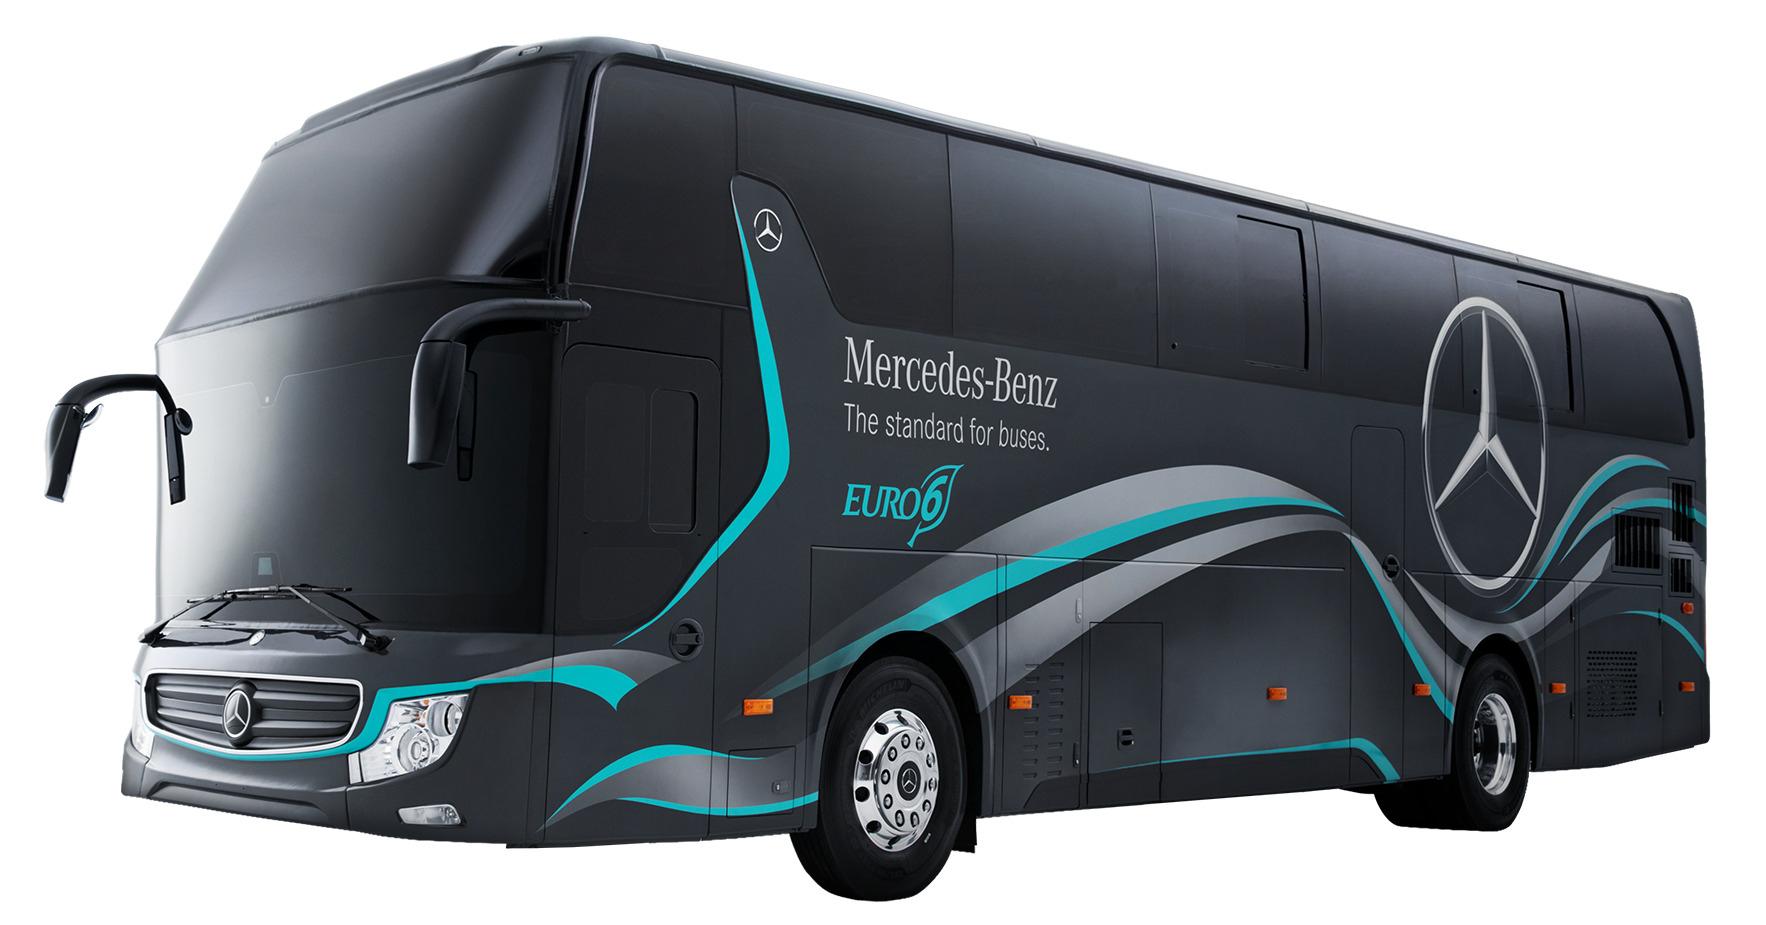 Daimler Buses autobus da turismo Euro 6